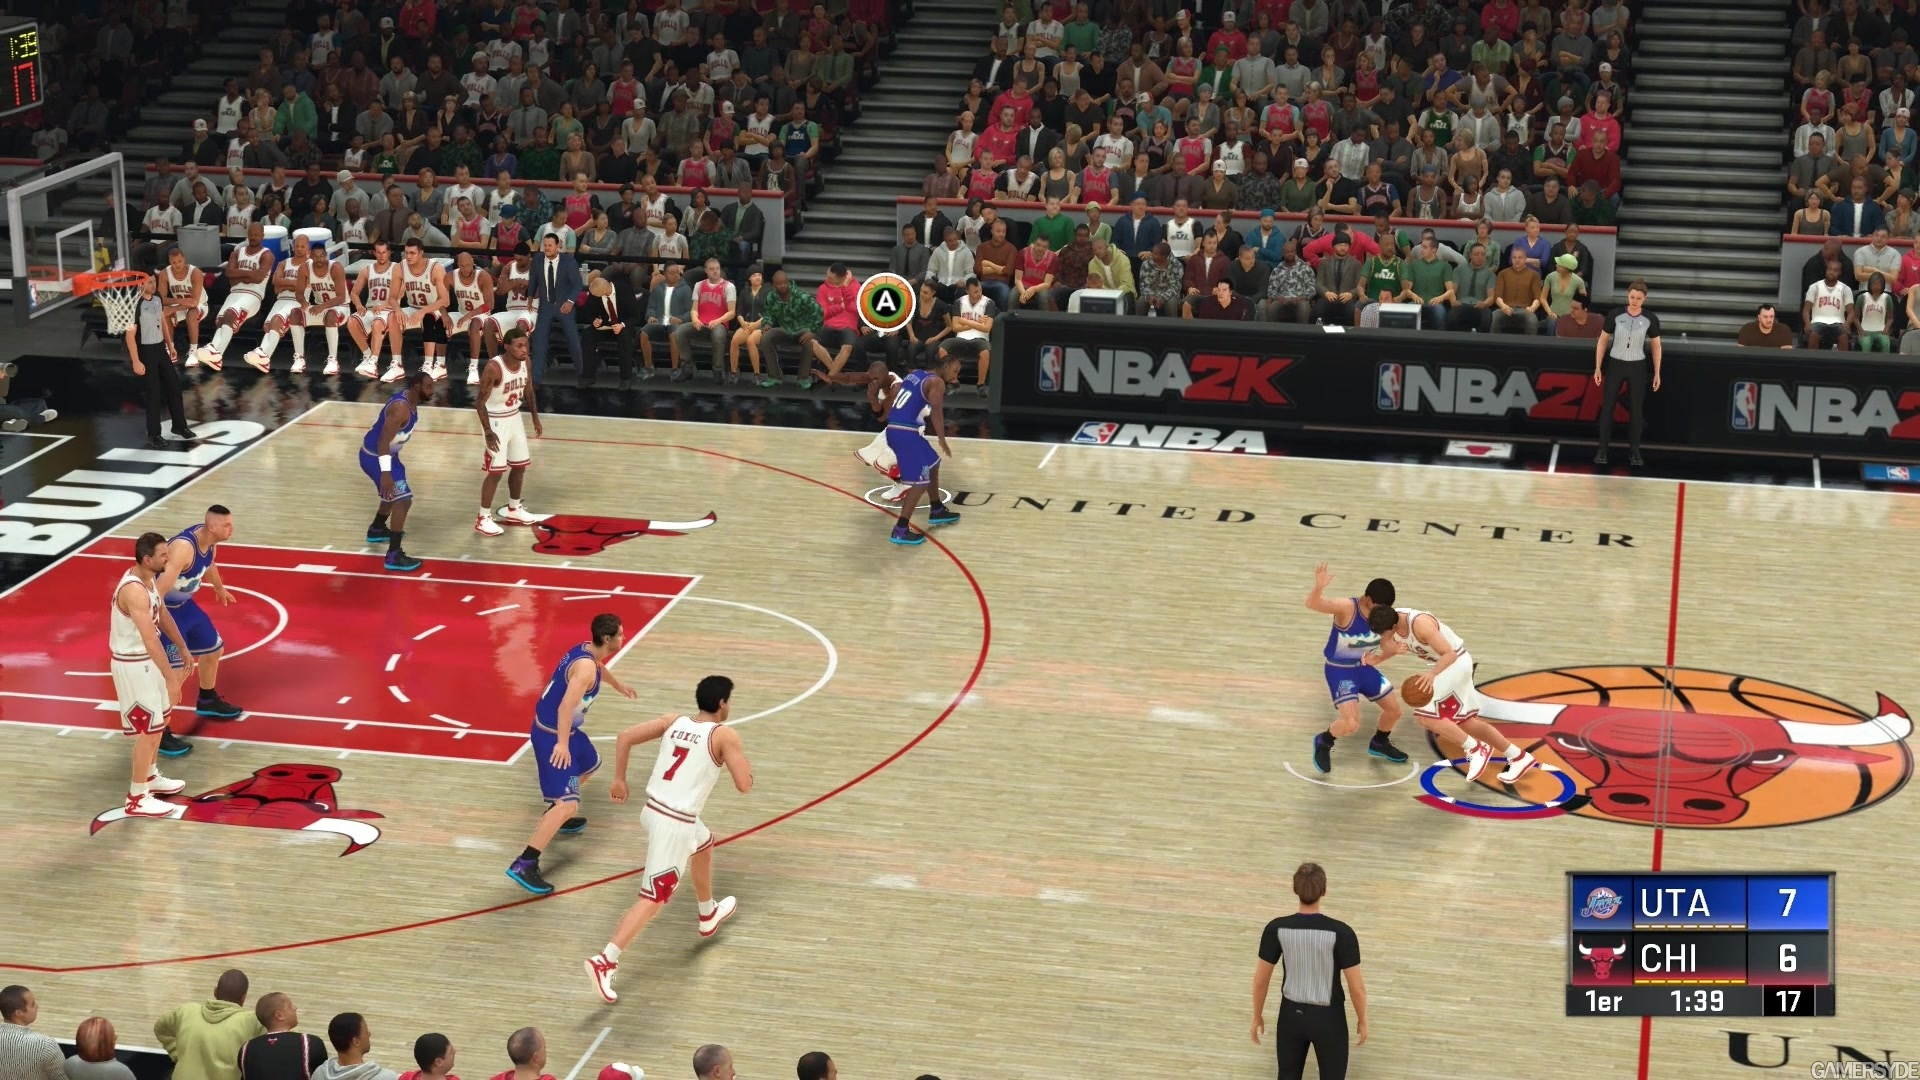 NBA 2K20 - PC - Bulls 98 vs Jazz 98 - First Half